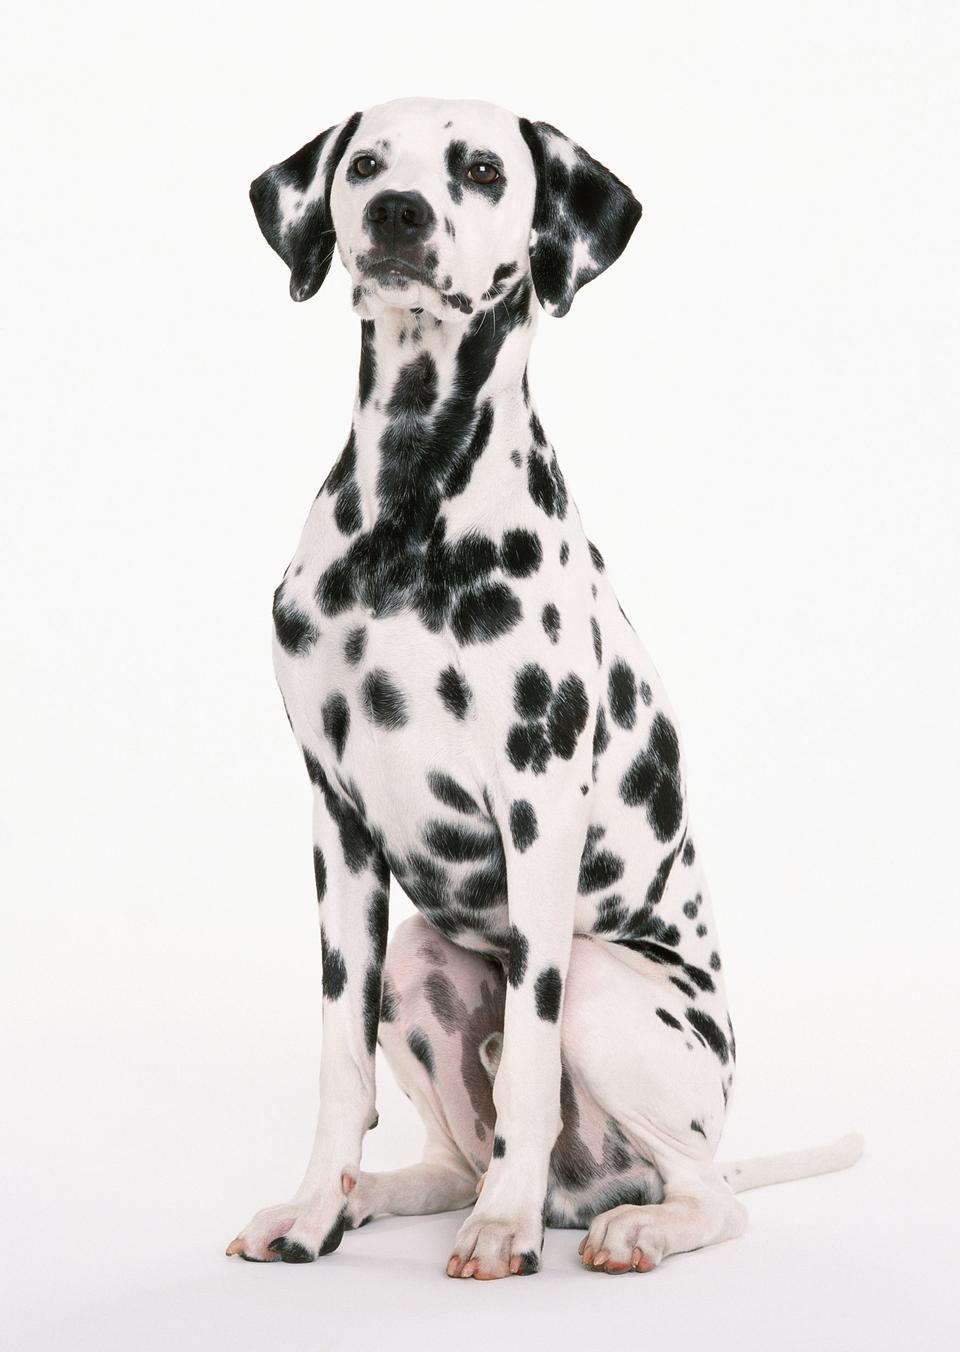 далматин собака, сидящая